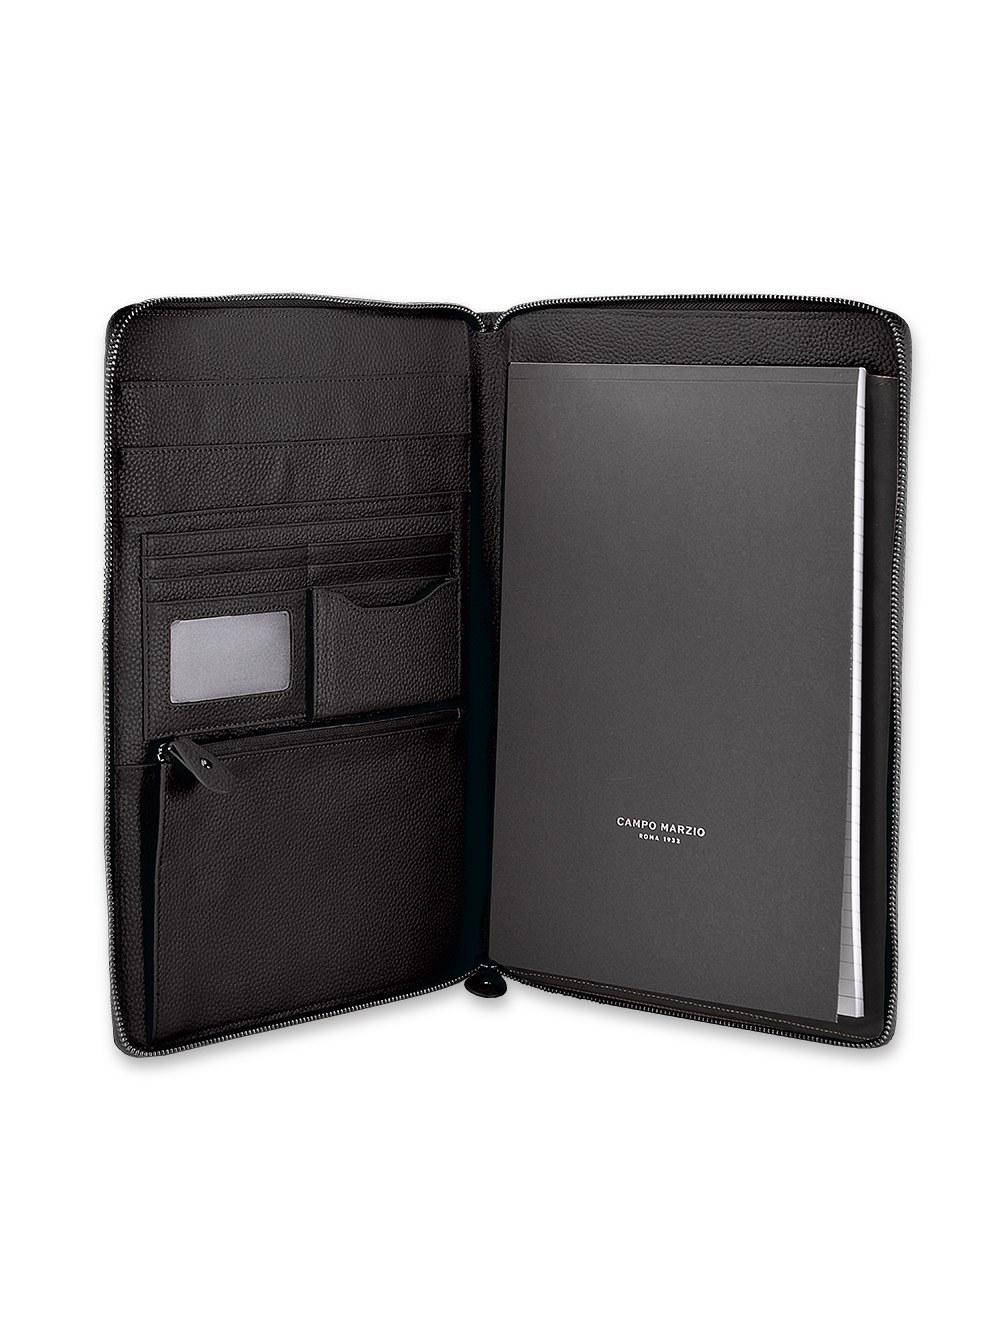 Portfolio Zip A4 - Black